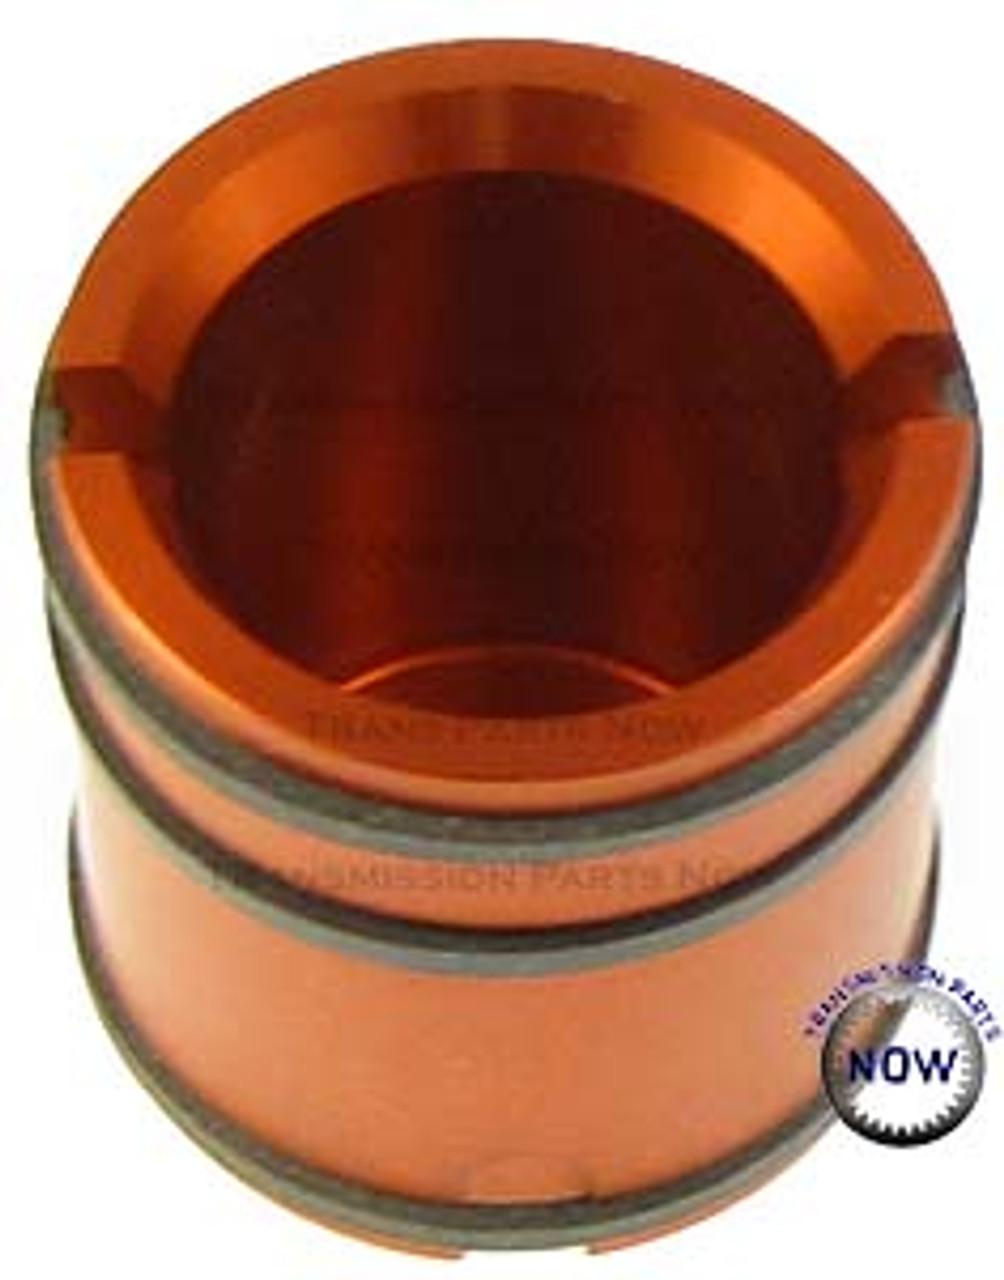 Sonnax, 44894-01K, 545RFE,45RFE, 65RFE, 66RFE, 68RFE, Dodge, Ram, Jeep, valve body, transmission repair, transmission